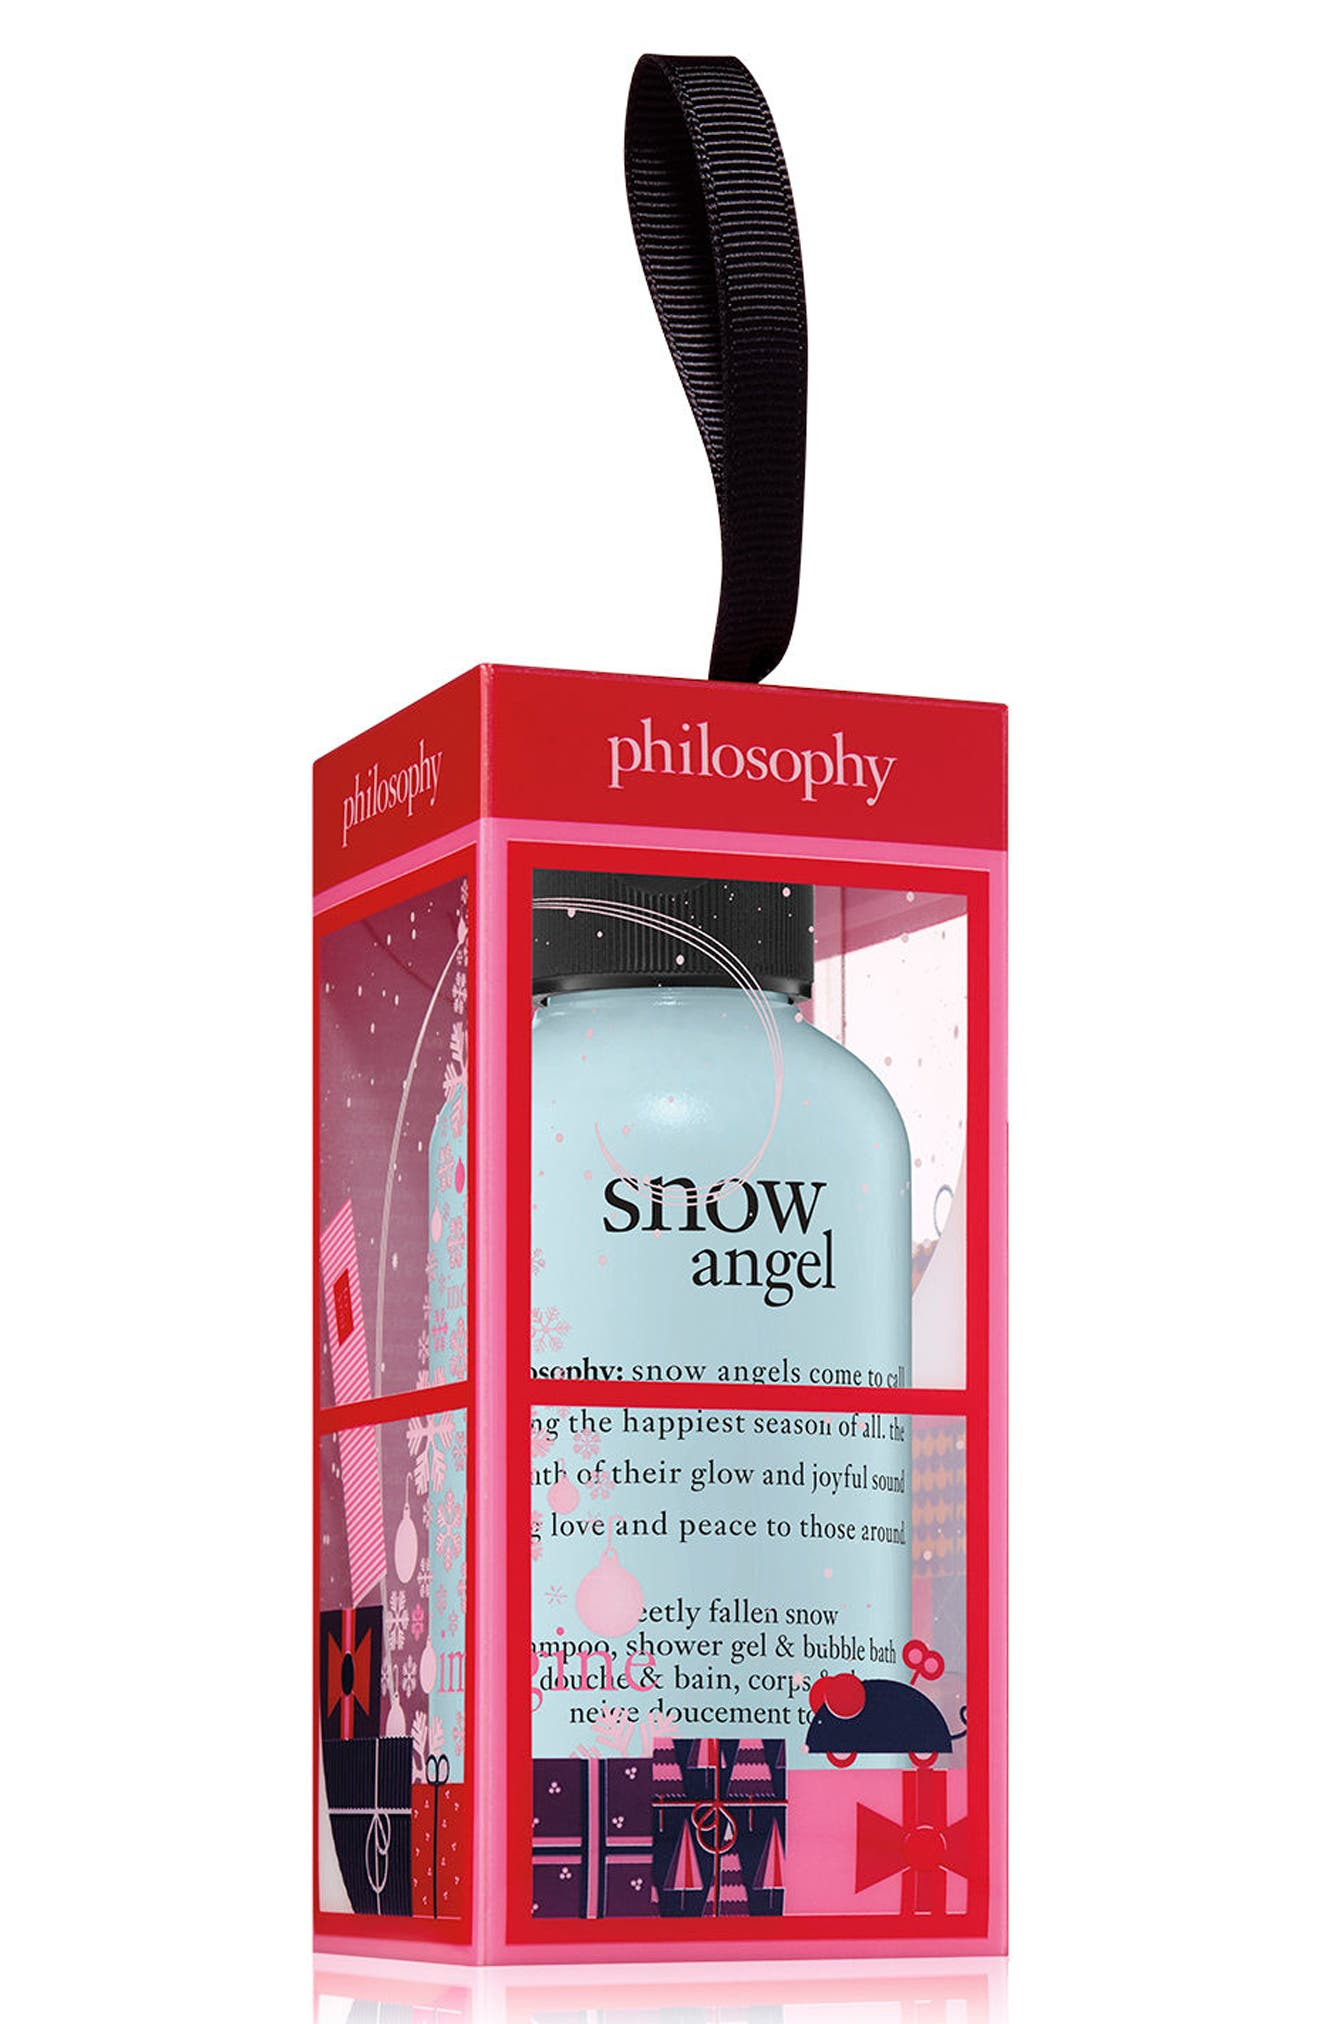 Alternate Image 1 Selected - philosophy snow angel shampoo, shower gel & bubble bath ornament (Limited Edition)